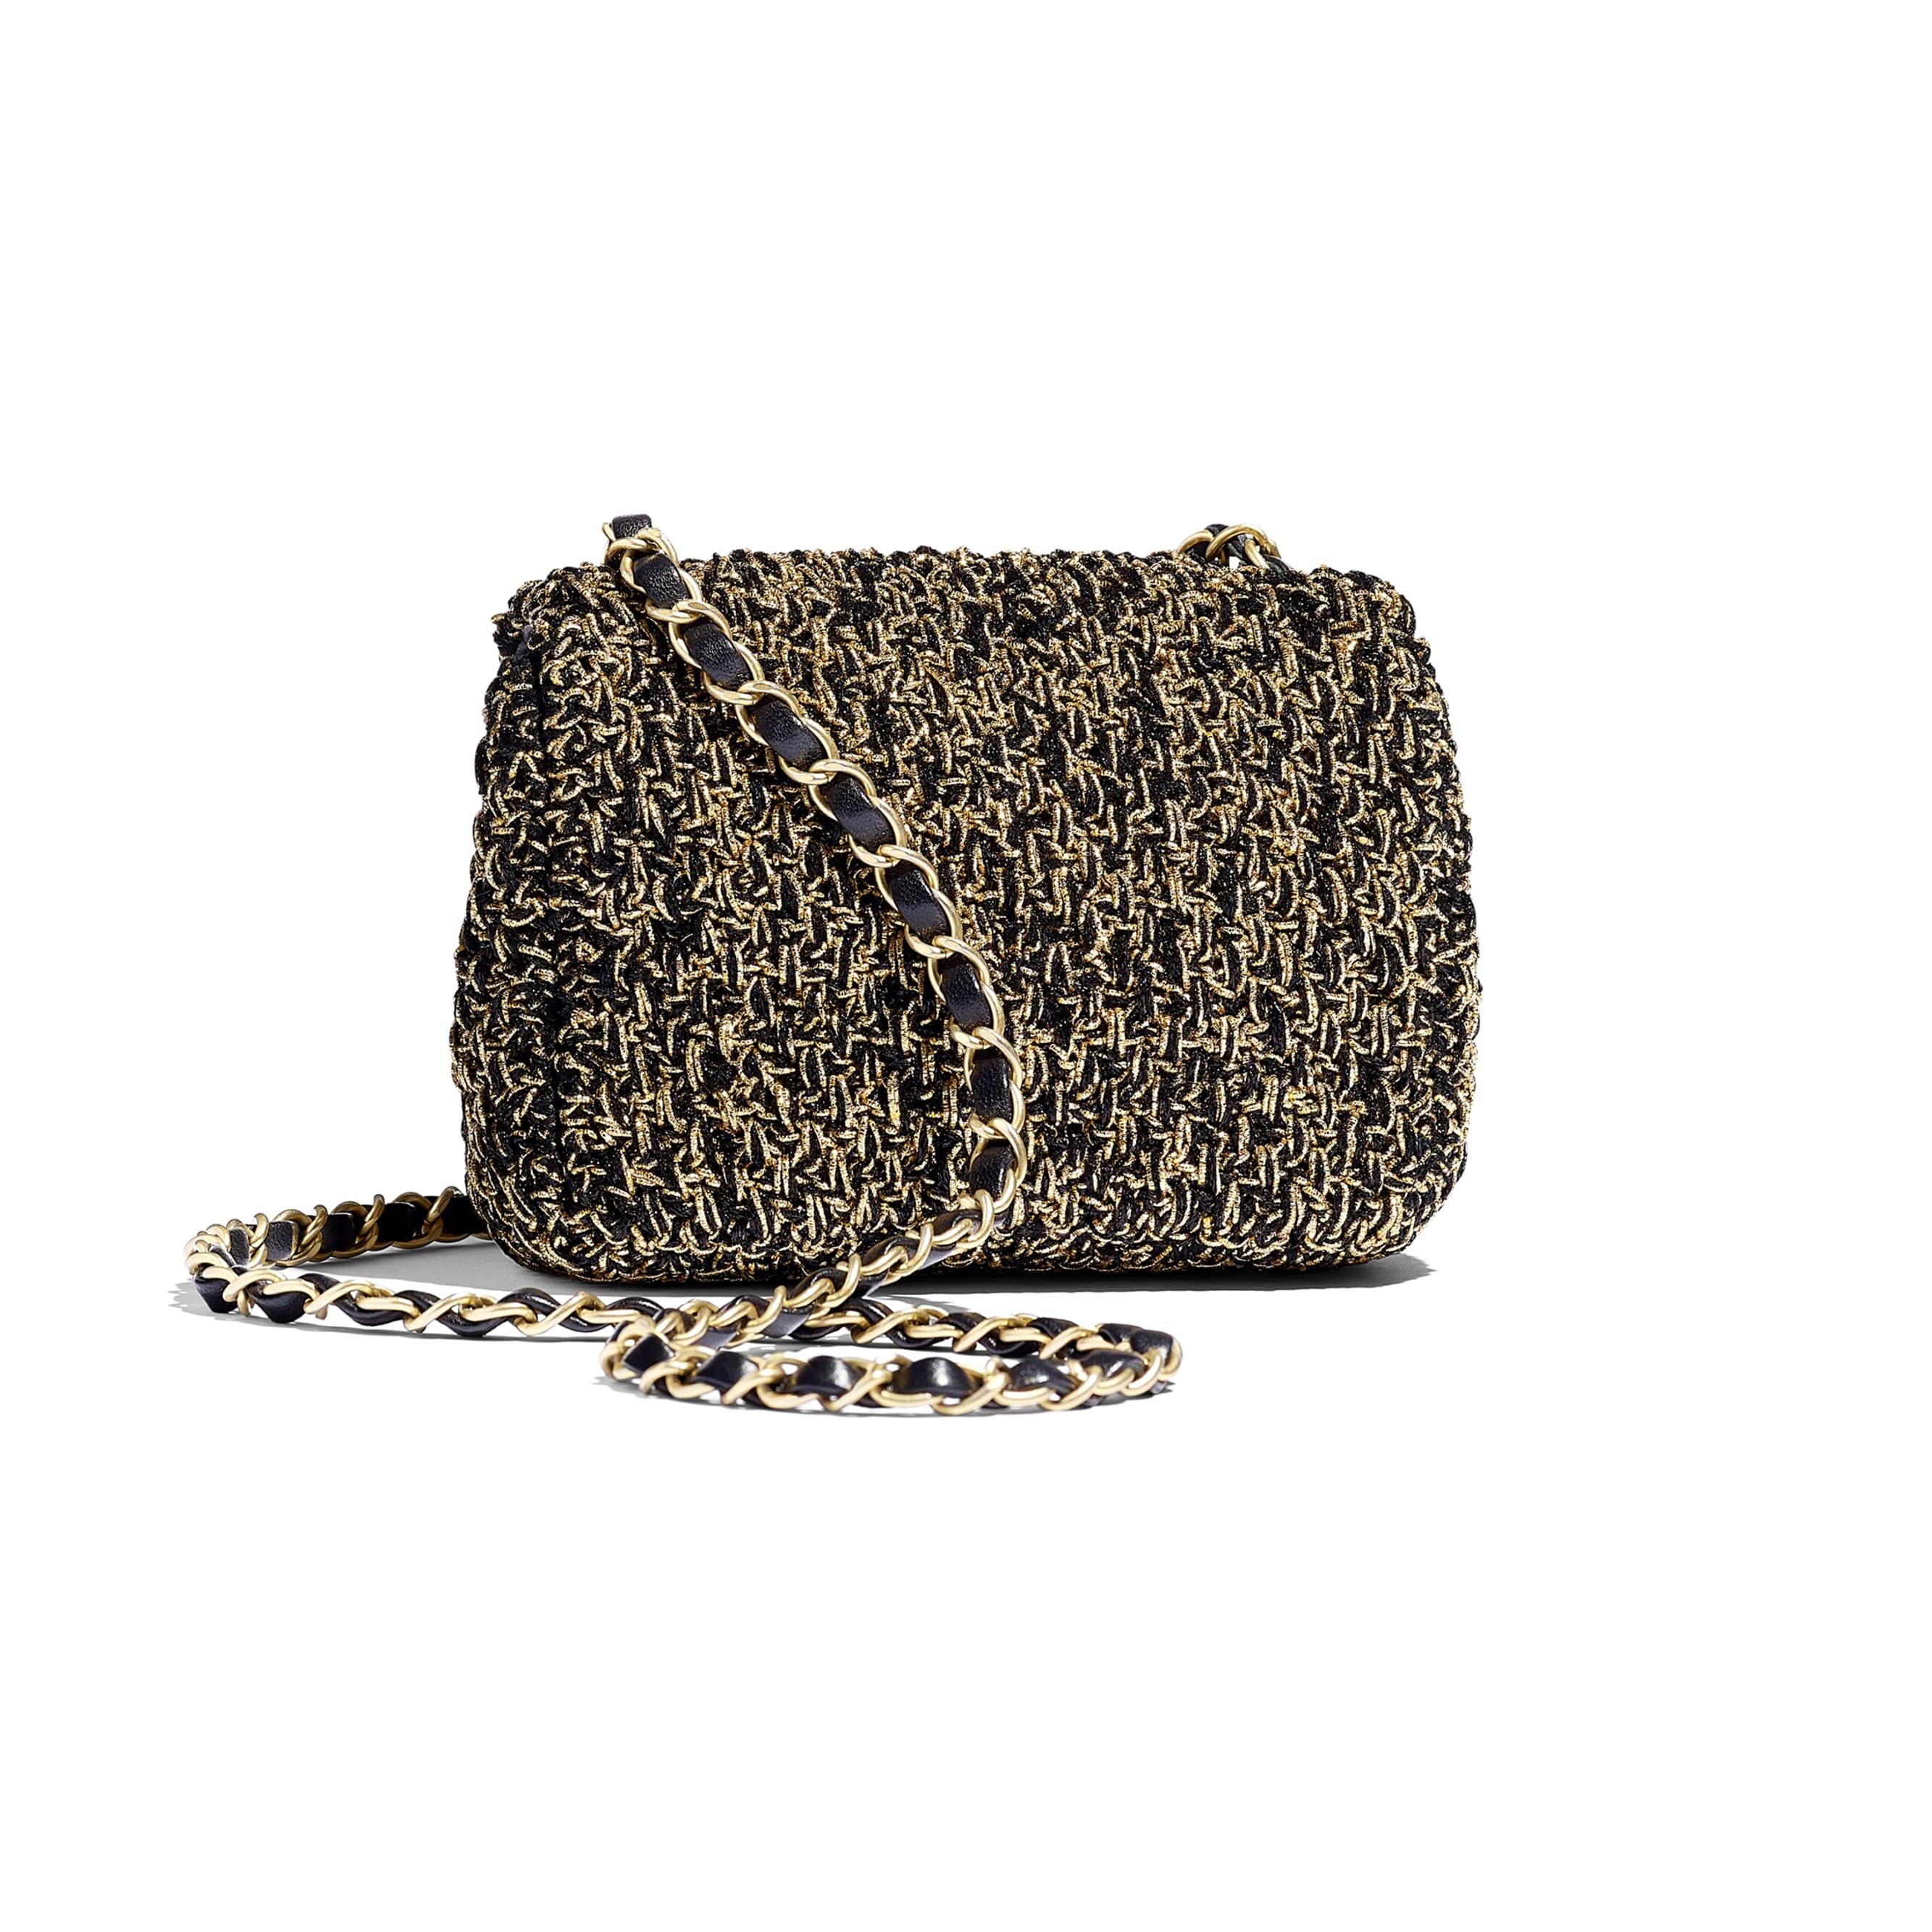 Mini Flap Bag - Black & Gold - Cotton, Mixed Fibers & Gold-Tone Metal - Alternative view - see standard sized version